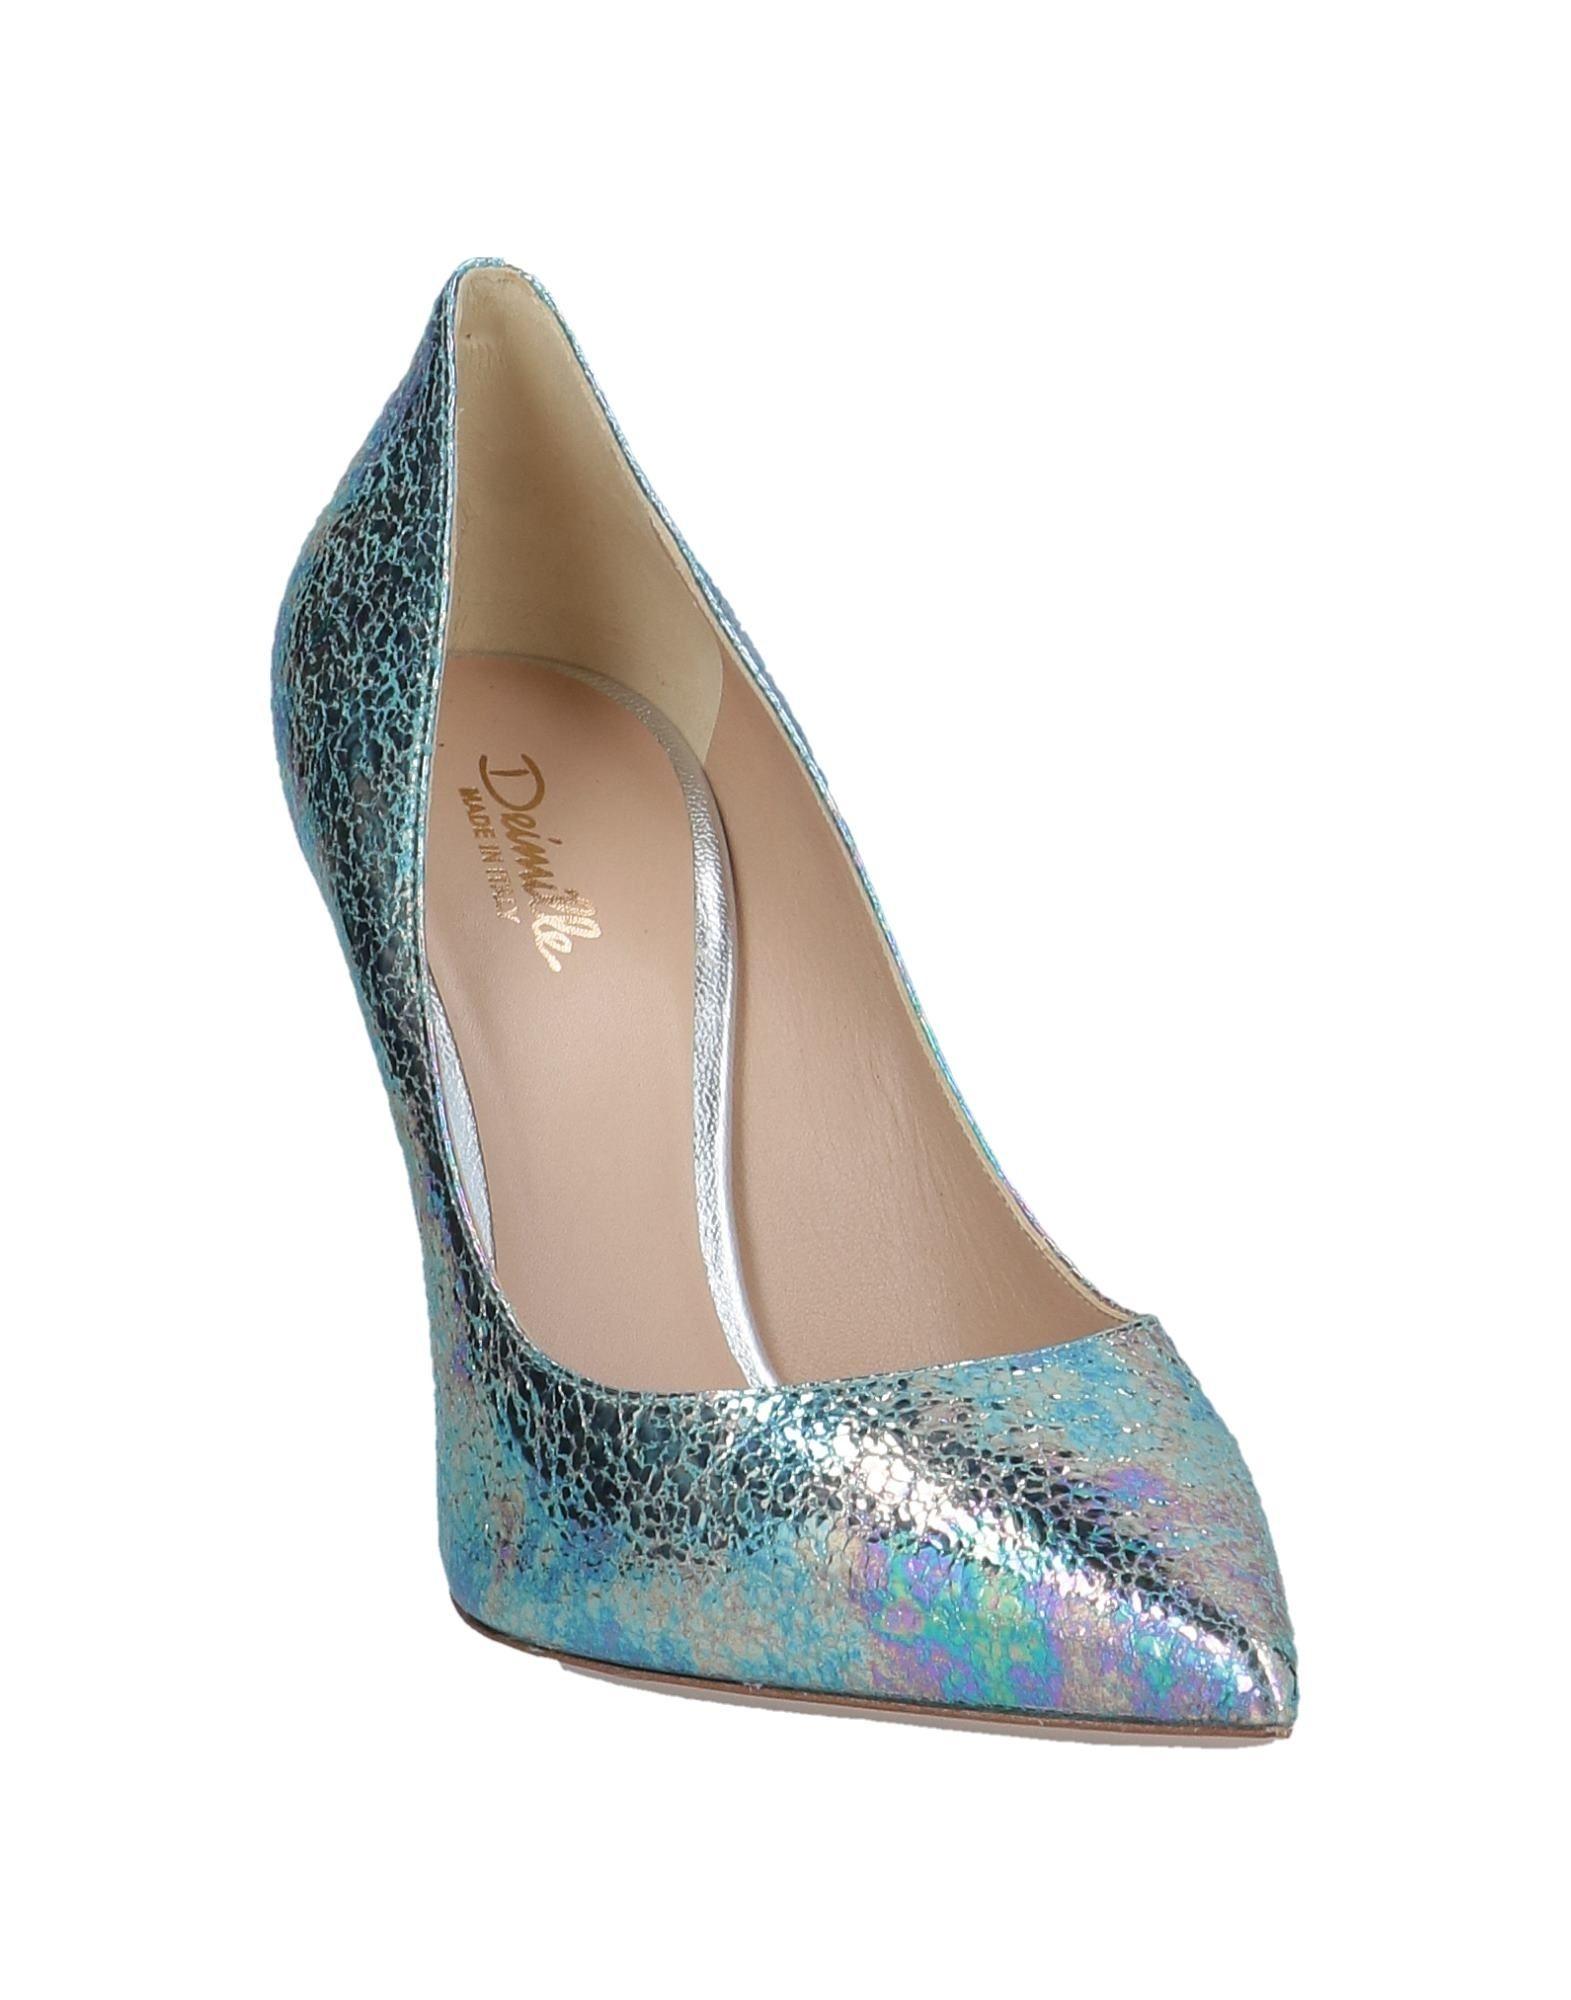 Stilvolle Damen billige Schuhe Deimille Pumps Damen Stilvolle  11556406DI 623414